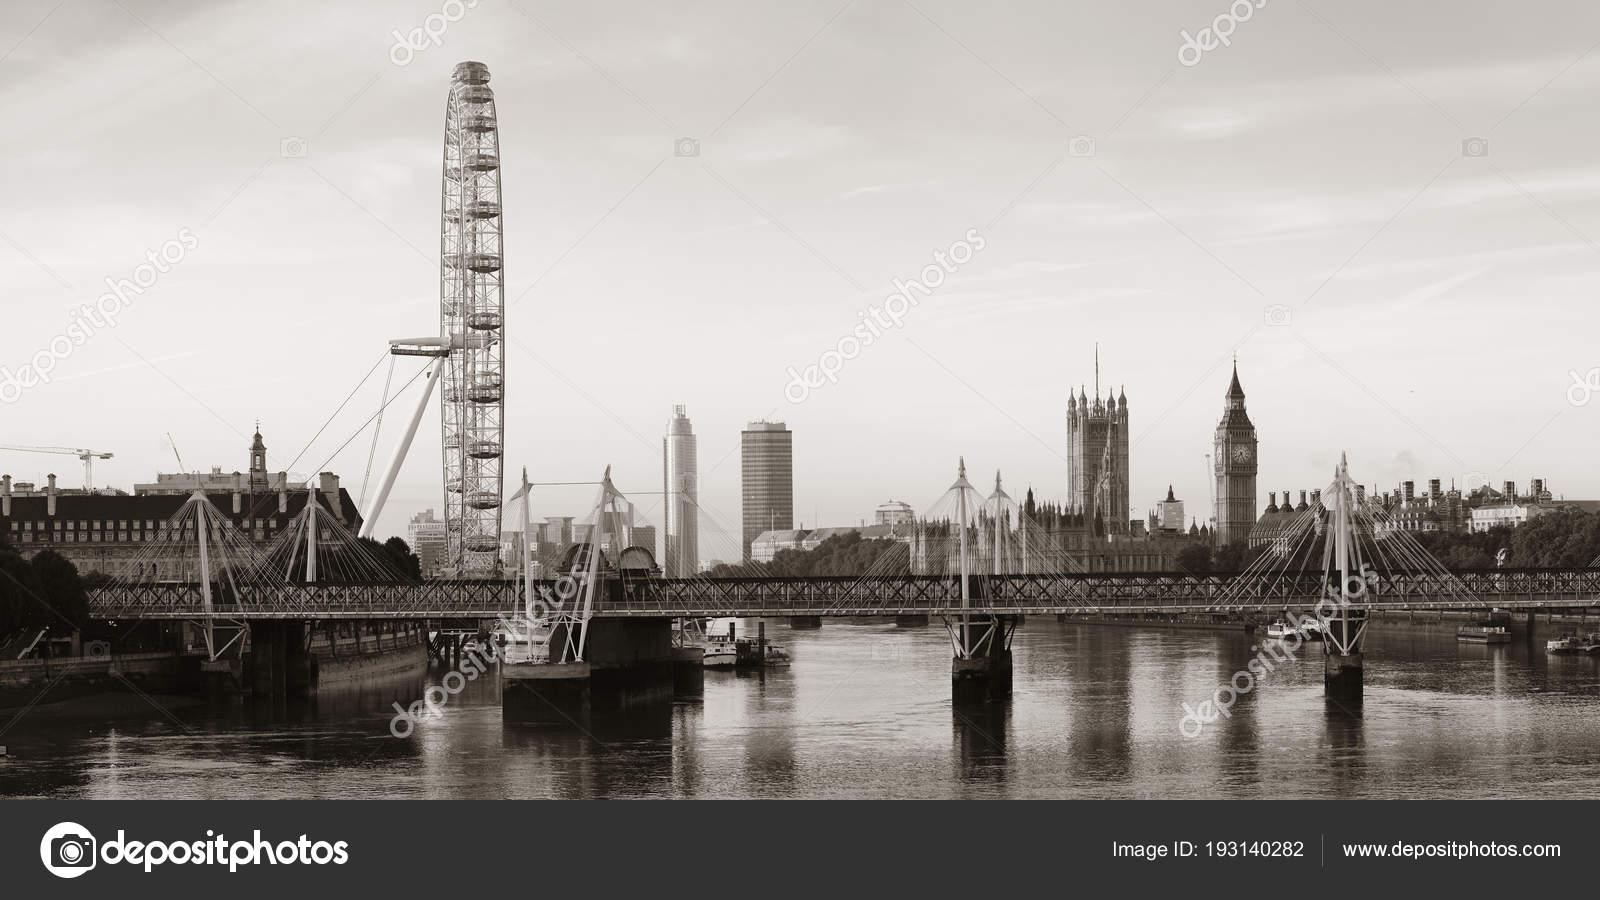 Thames River Panorama London Eye Westminster Palace Black